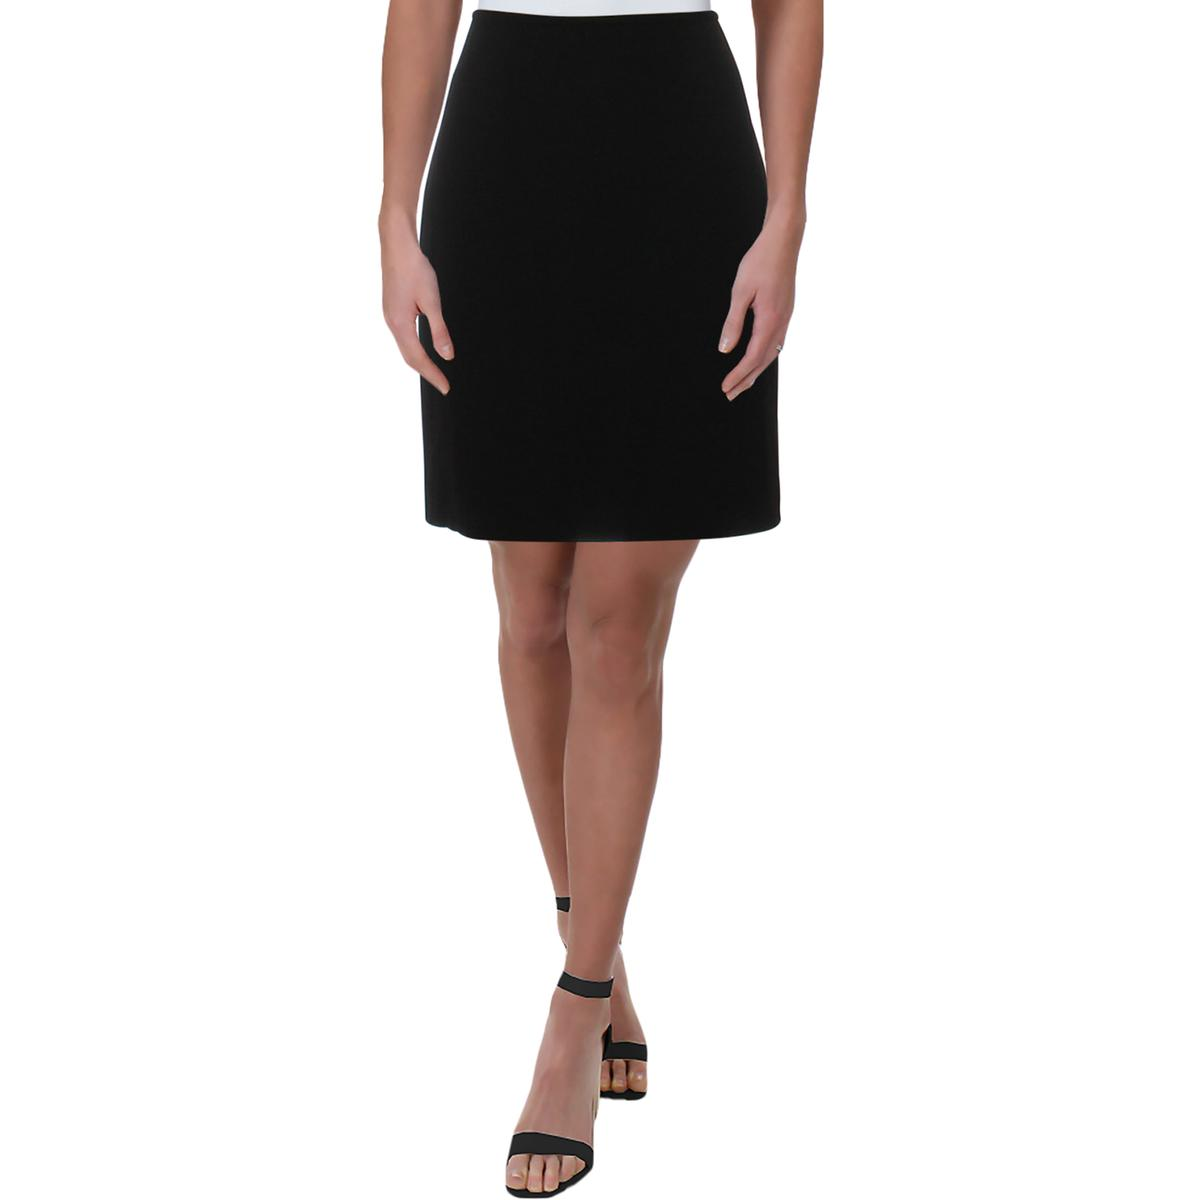 T Tahari Womens Aline Faux Leather Wear To Work Pencil Skirt BHFO 0519